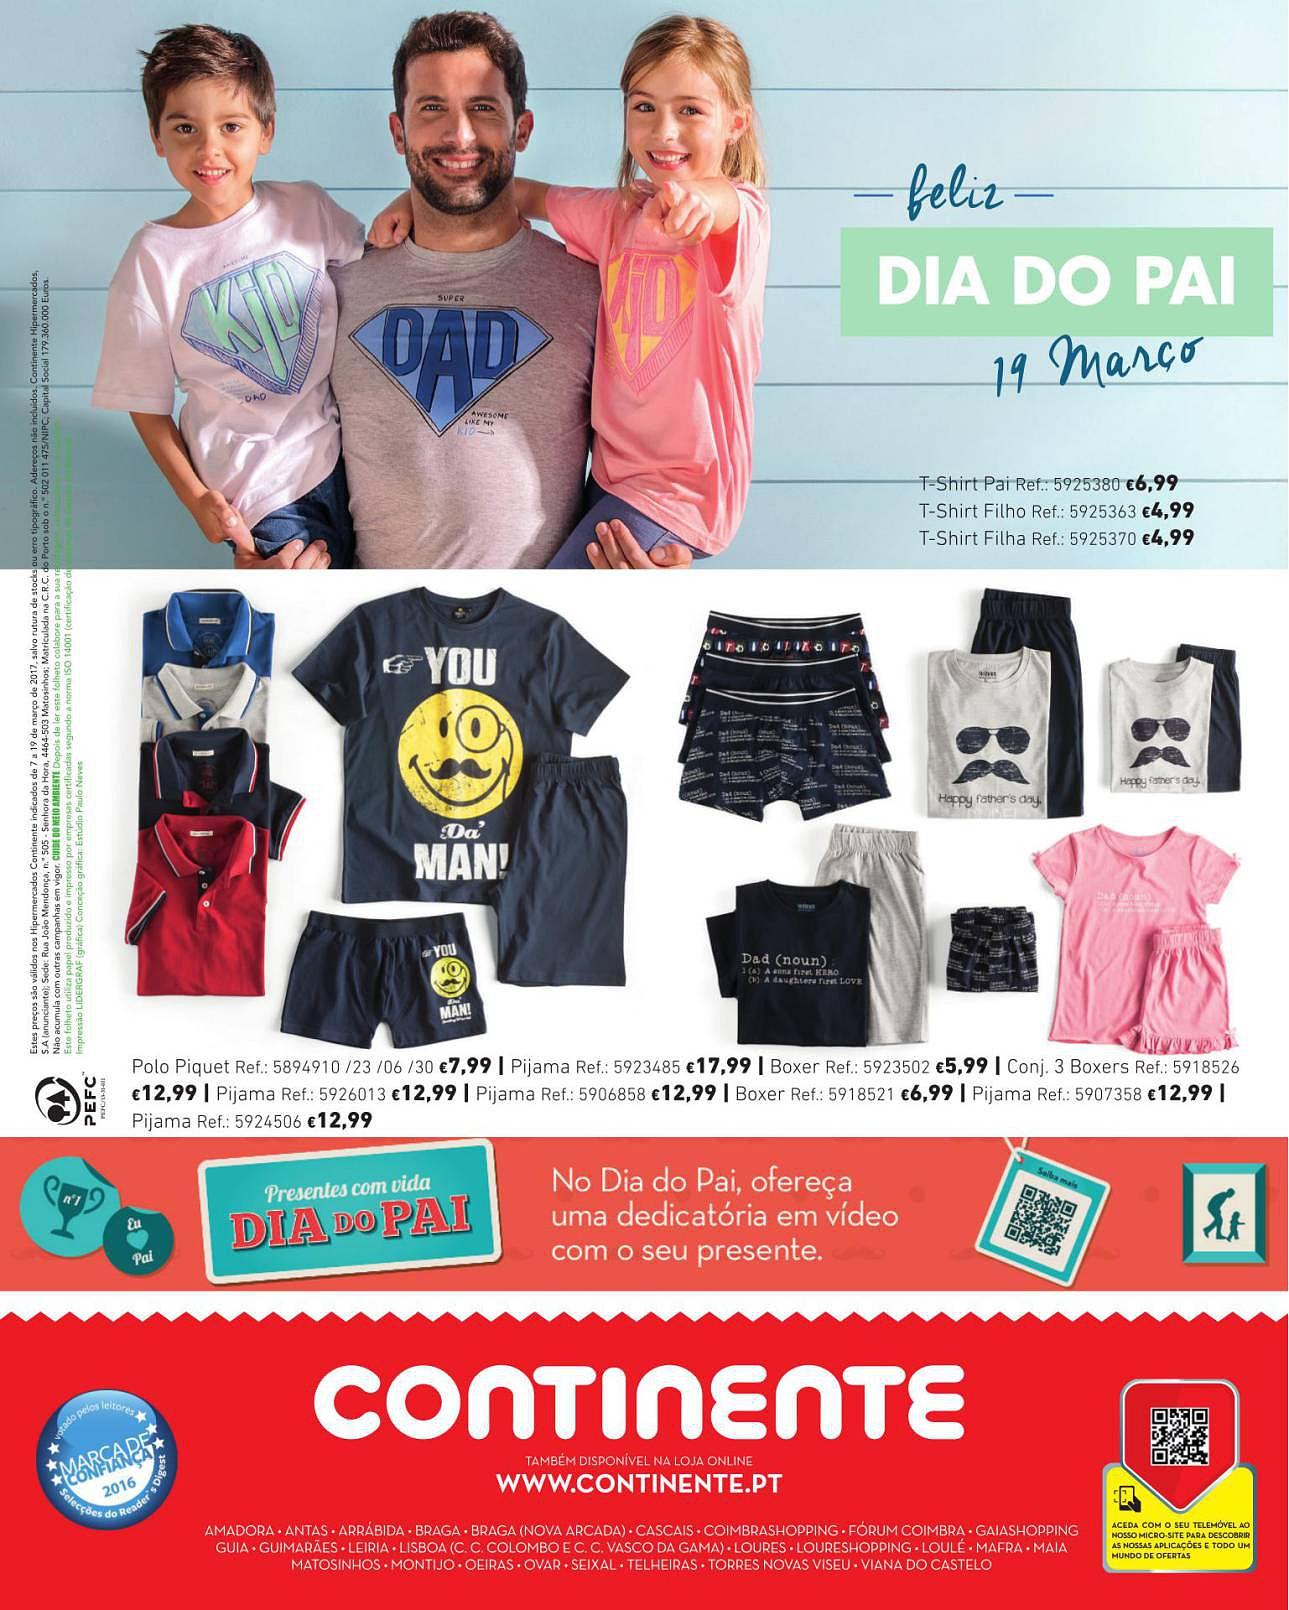 continente-moda-24.jpg